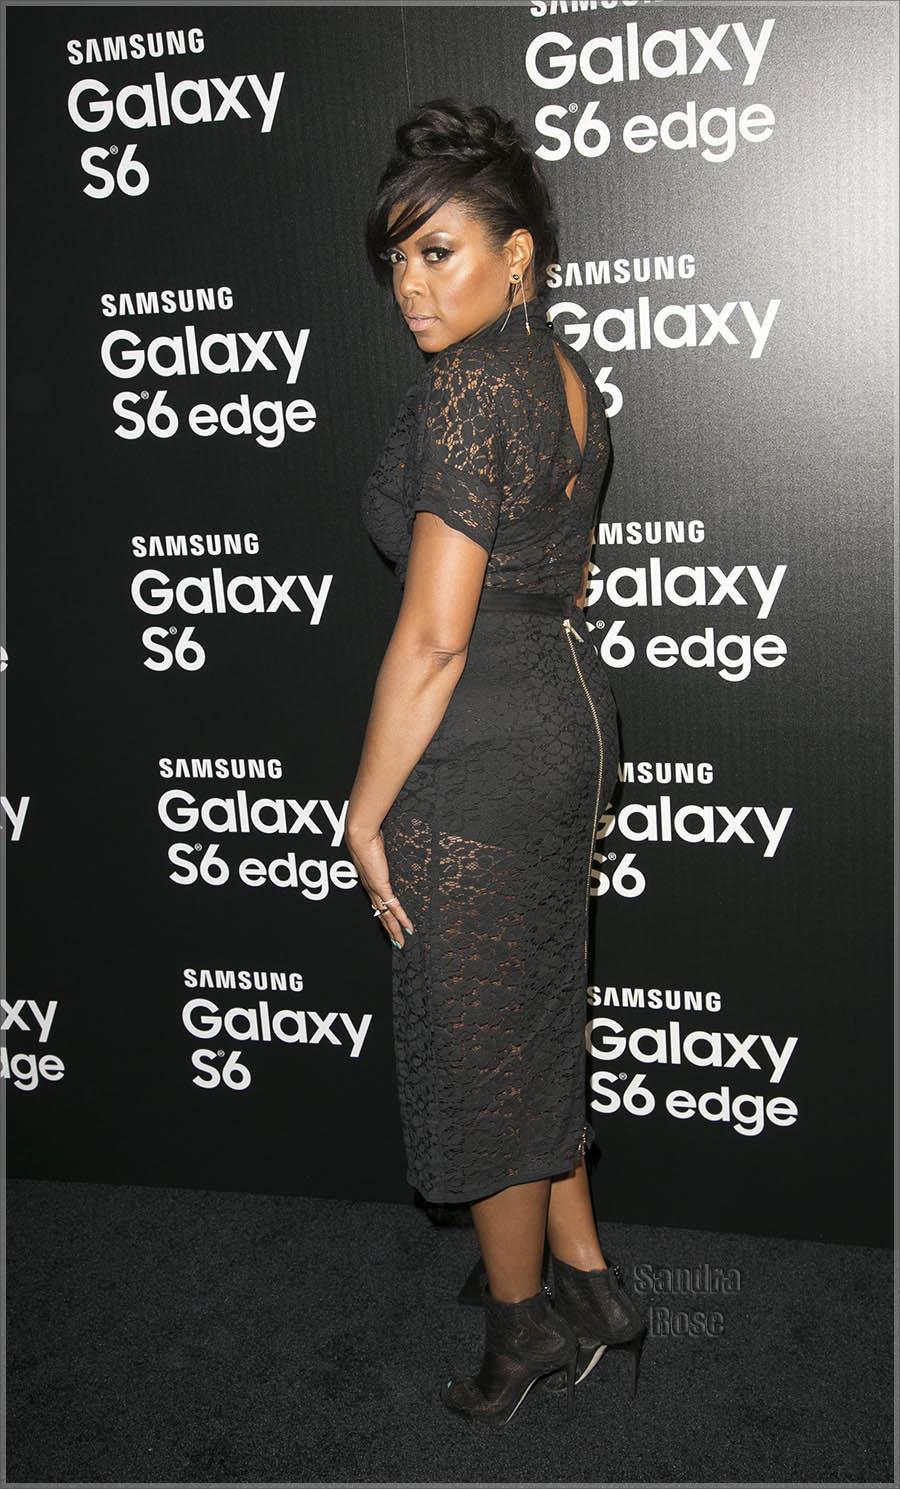 Taraji P Henson attends Samsung Celebrates Launch of Galaxy S6